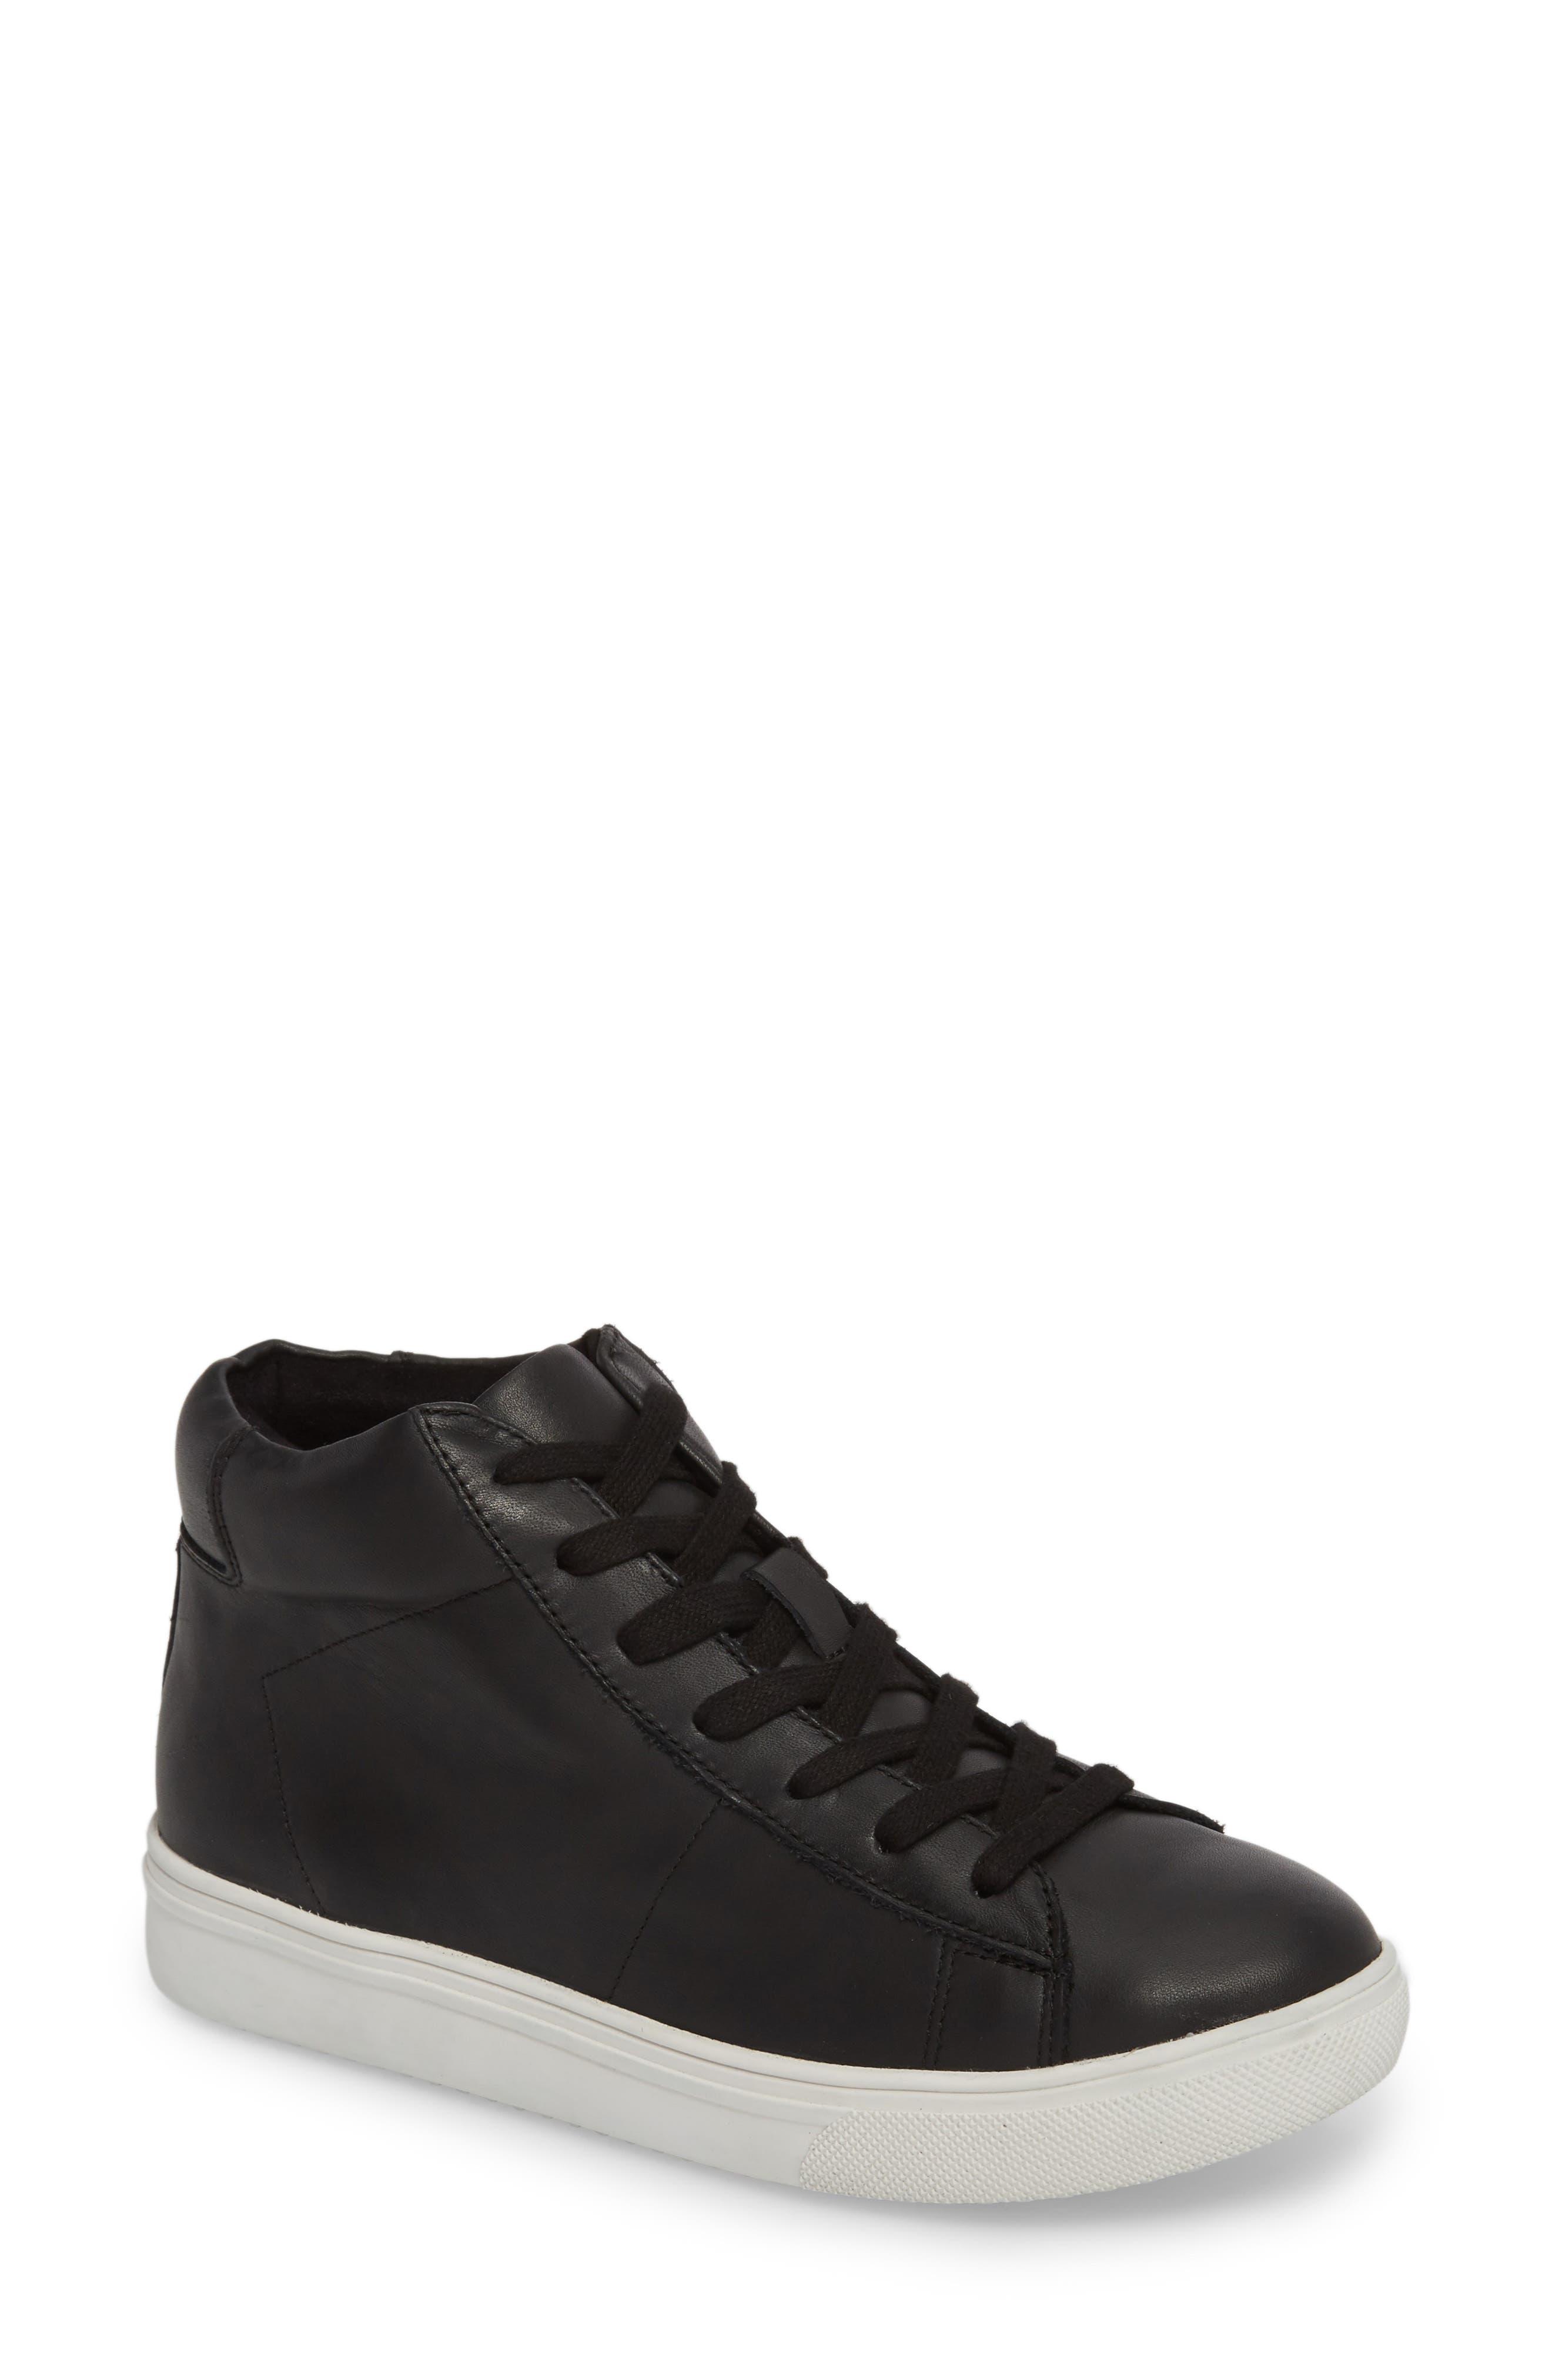 Jax Waterproof High Top Sneaker,                             Main thumbnail 1, color,